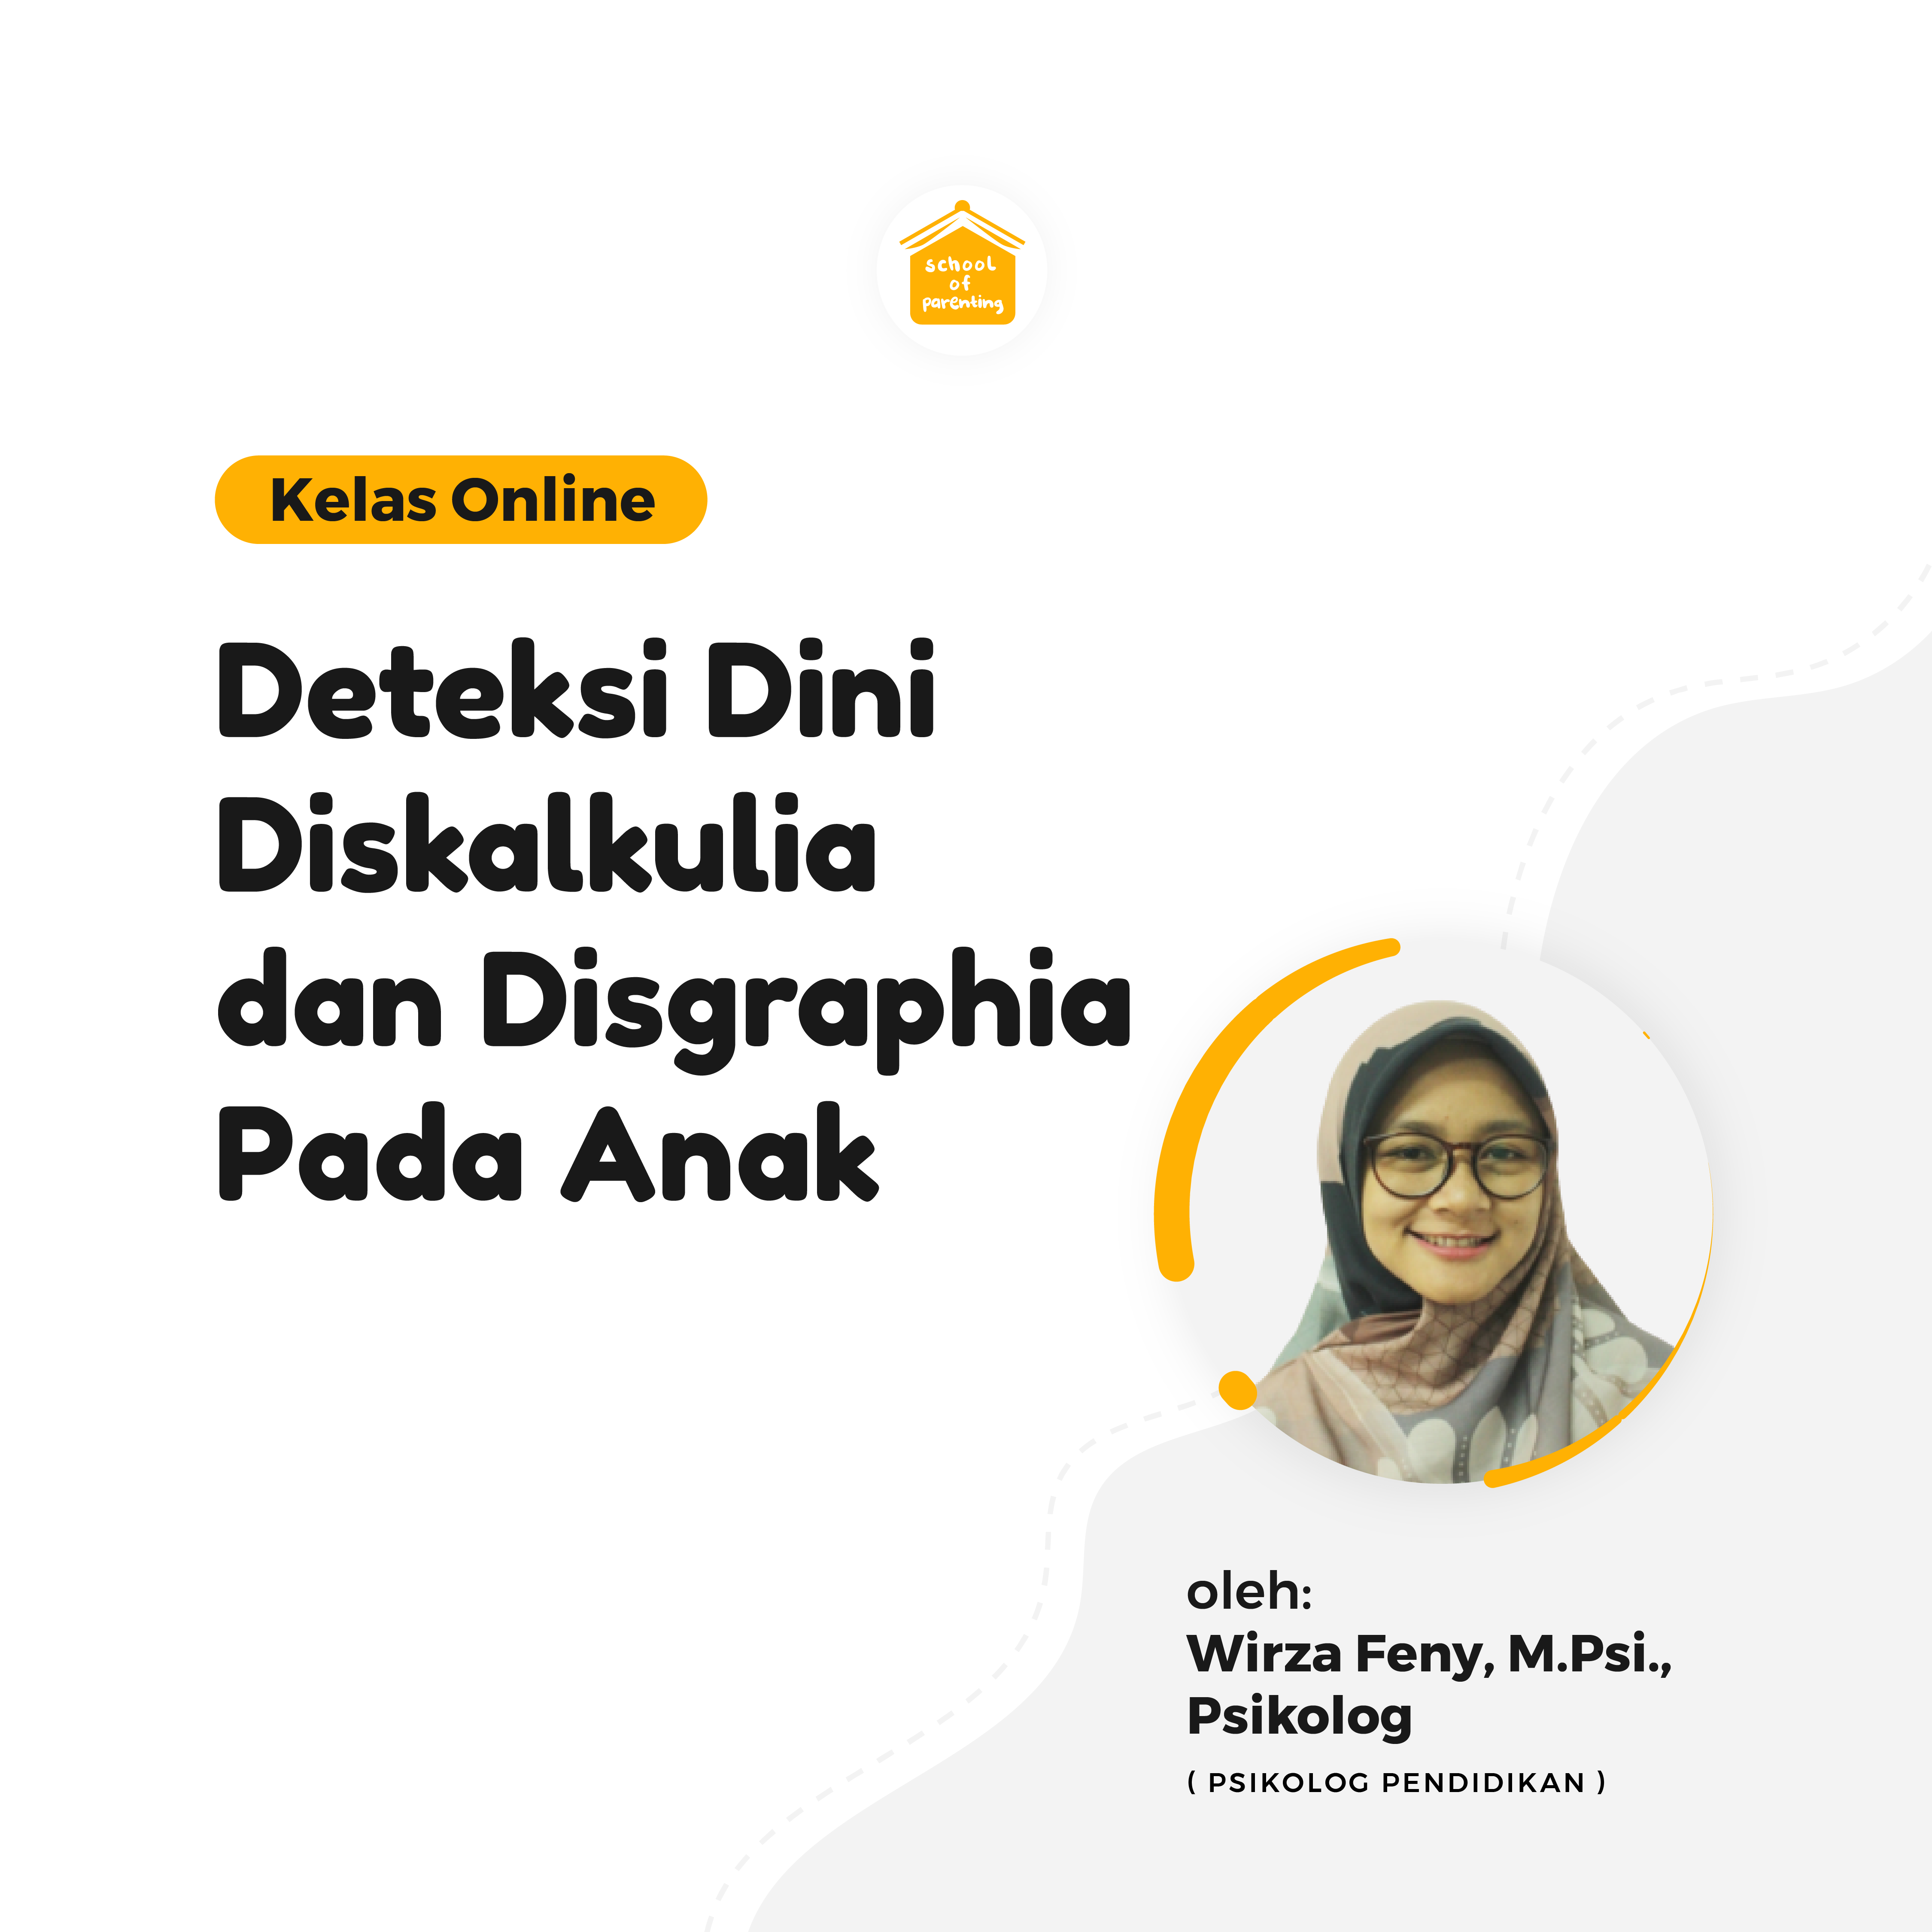 Deteksi Dini Disgrafia dan Diskalkulia